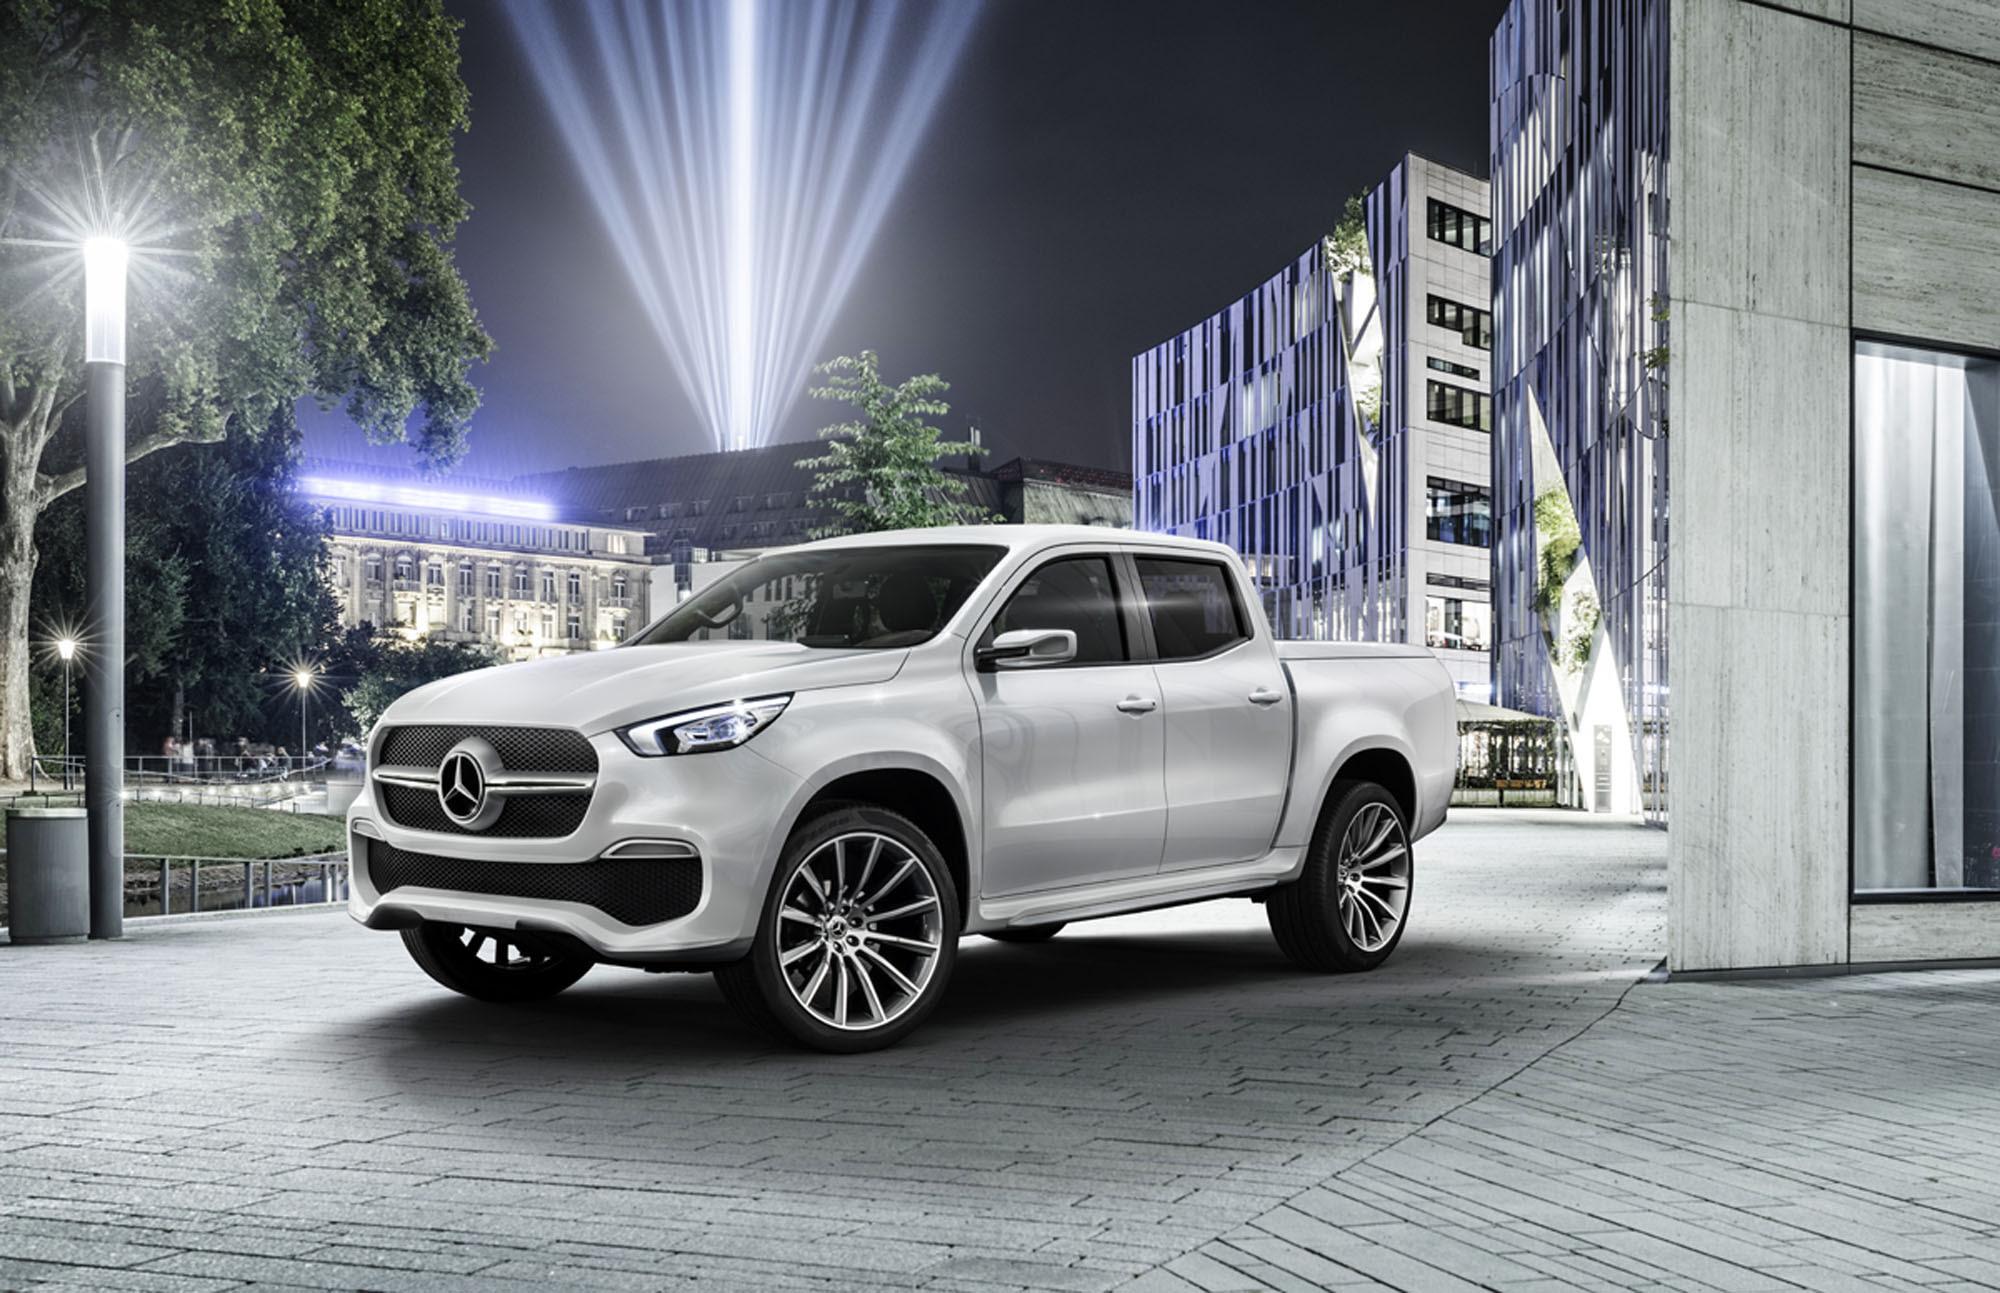 Mercedes-Benz unveils its first pick-up truck